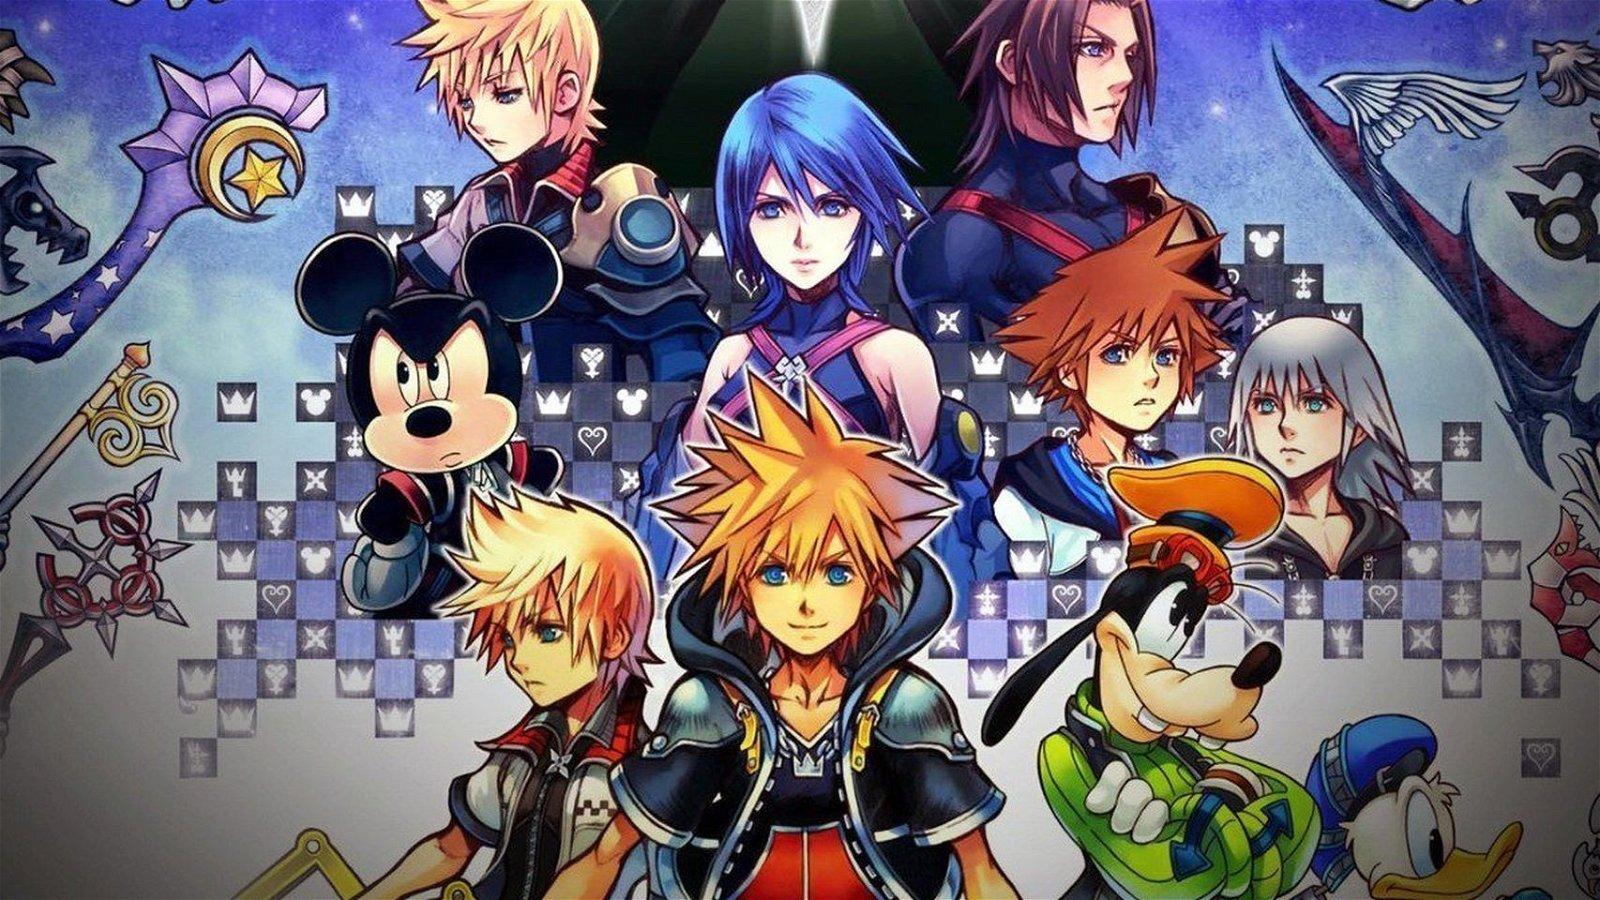 Un crasheo destroza un speedrun de Kingdom Hearts 2